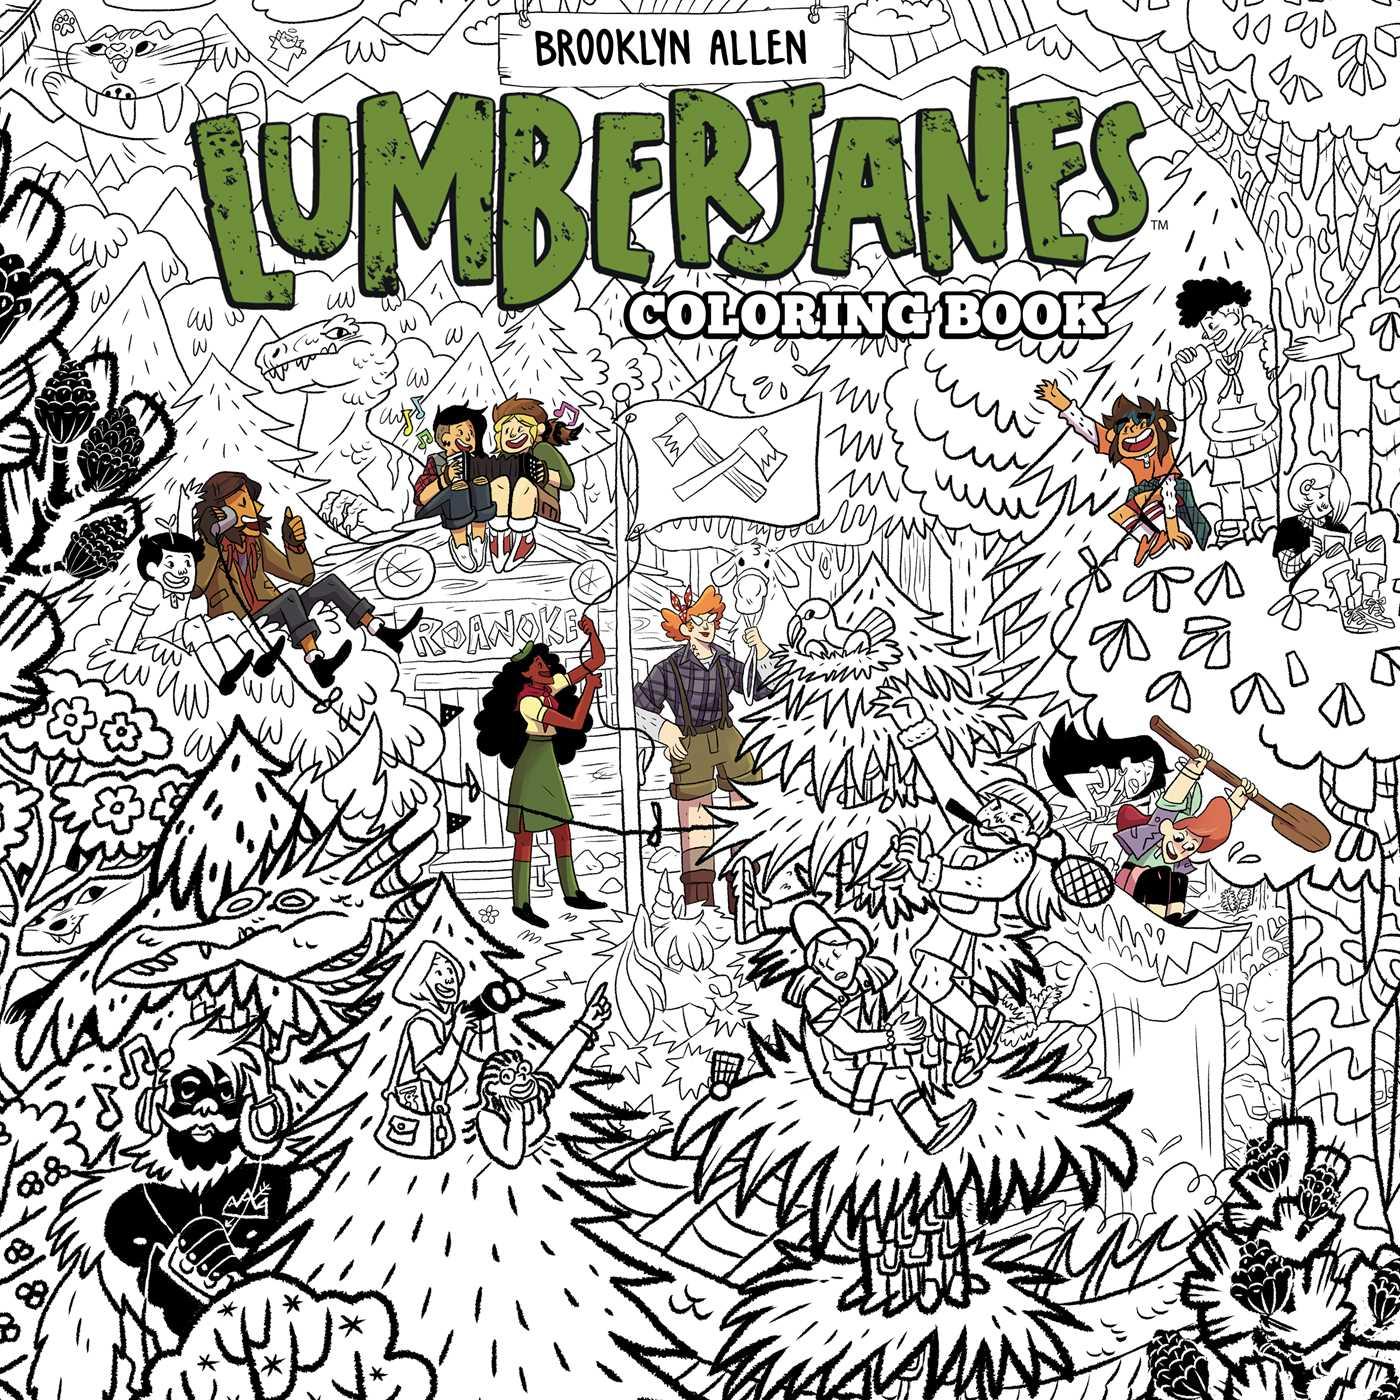 Lumberjanes coloring book 9781684152094 hr